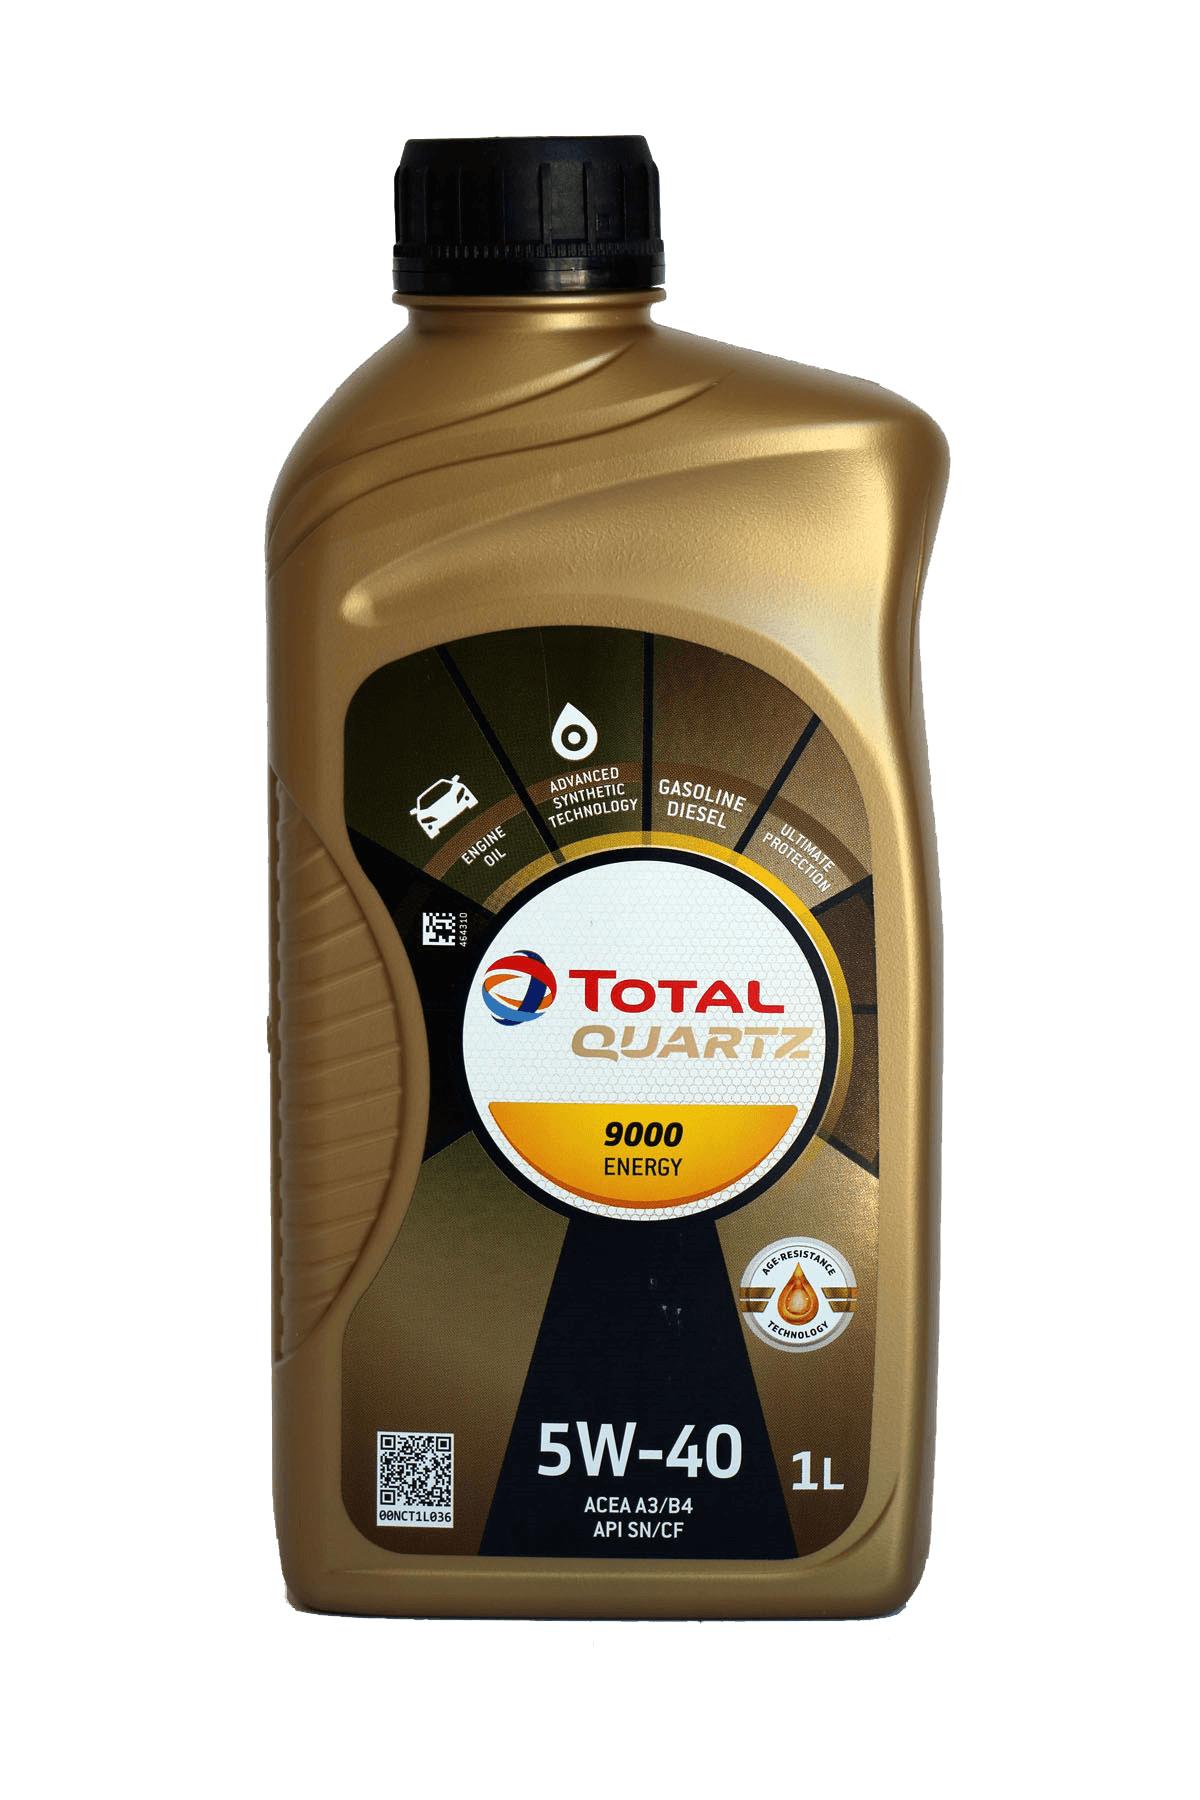 Total Quartz 9000 ENERGY 5W-40 Motoröl, 1l